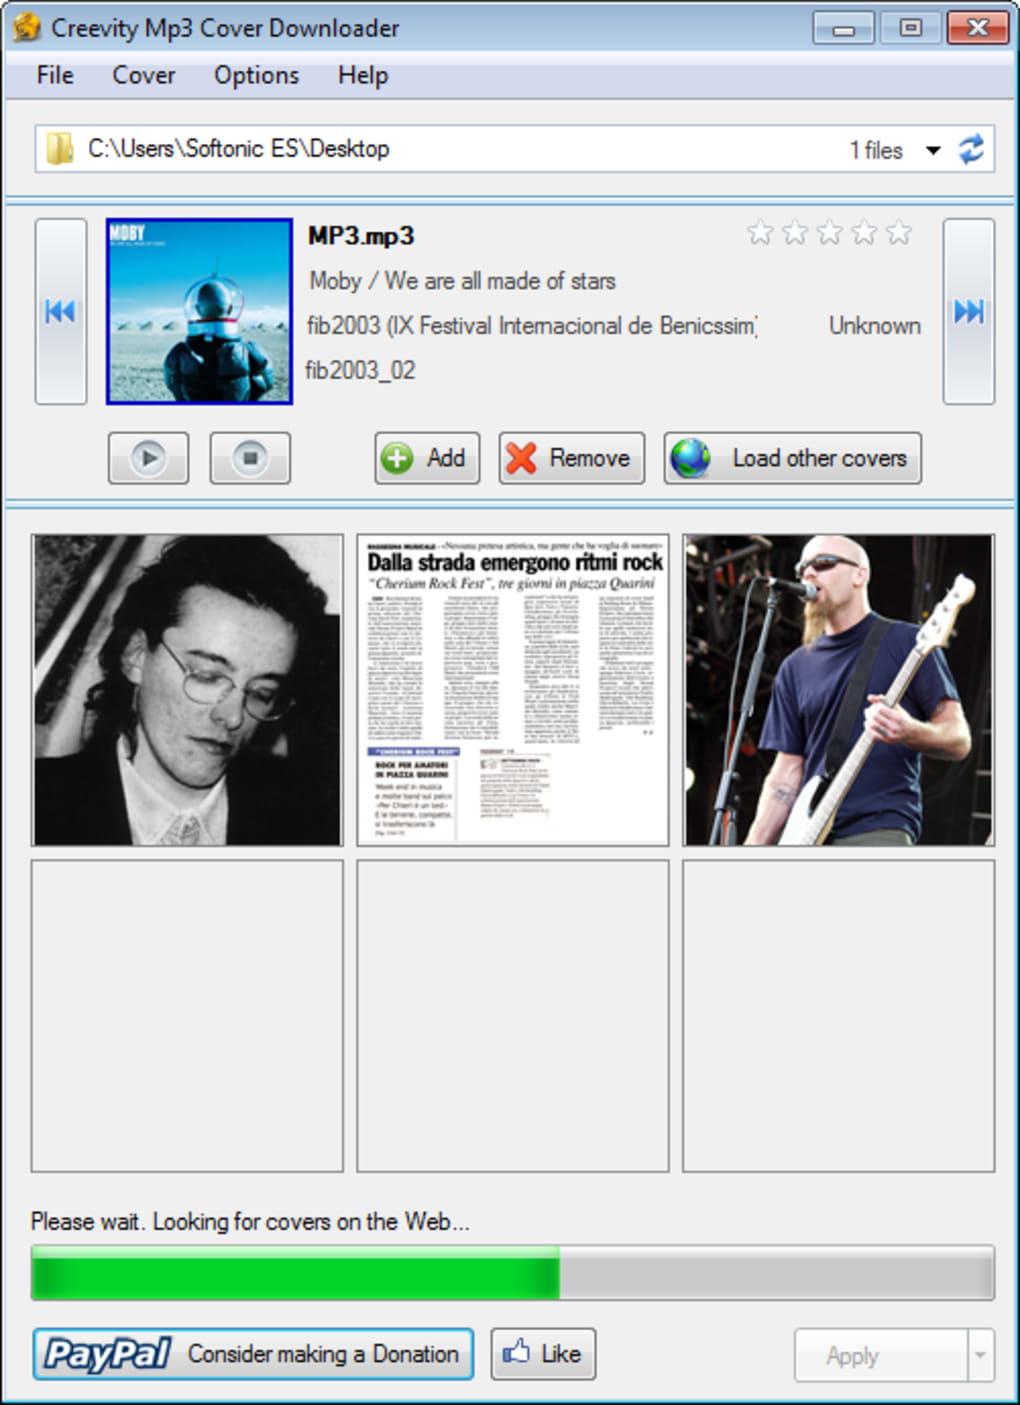 mp3 cover downloader software